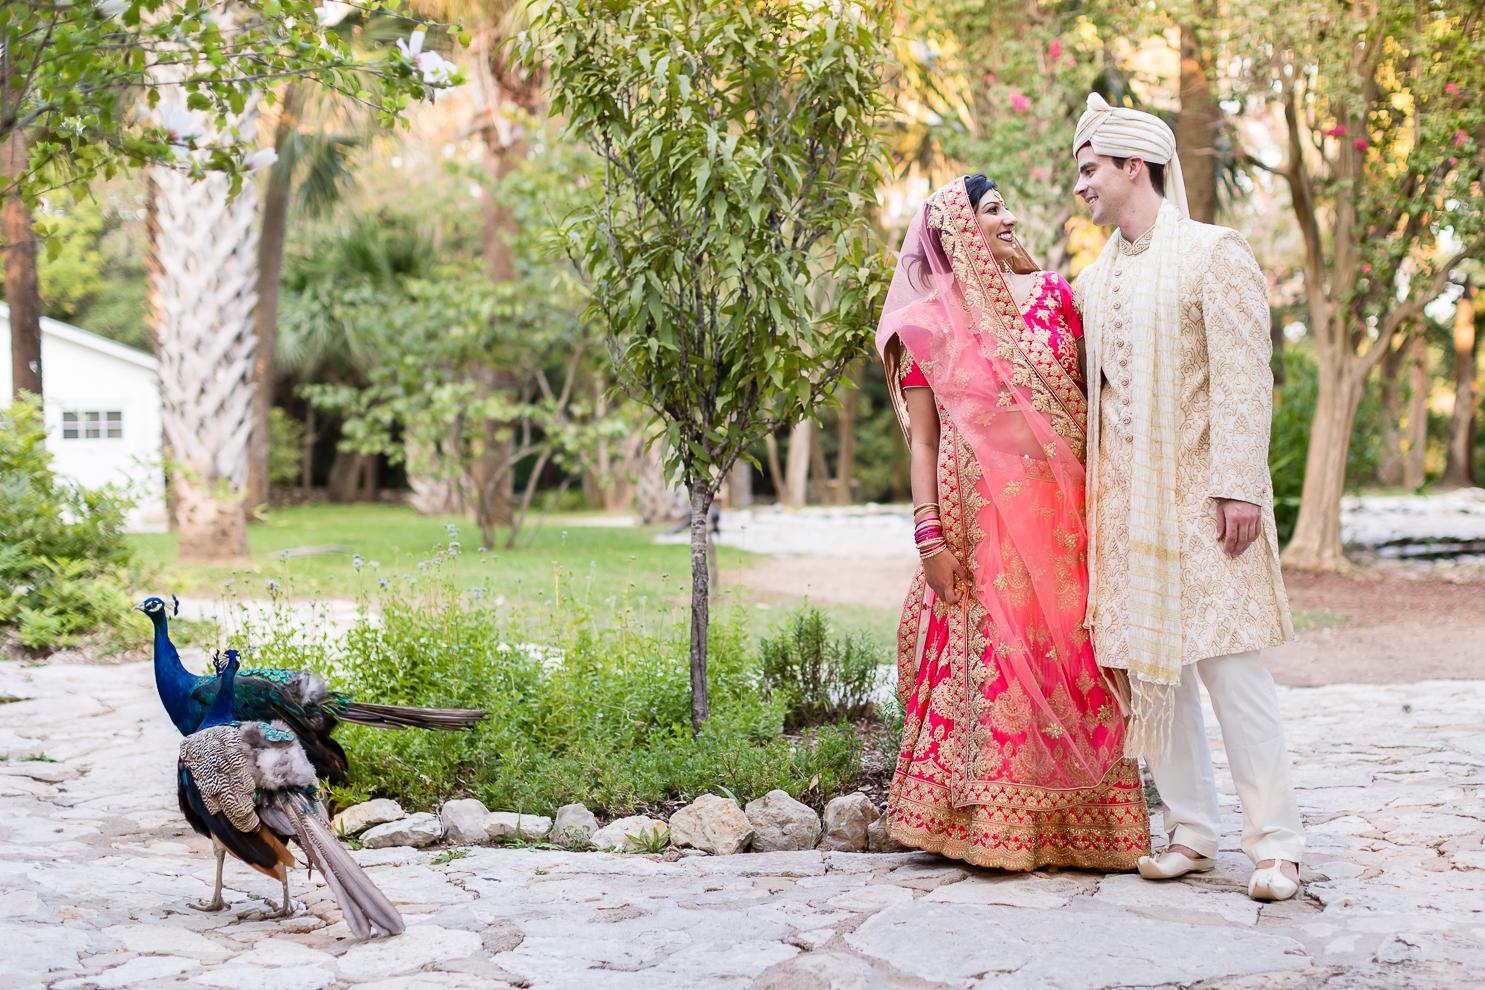 Hindu-wedding-mayfield-park-austin-south-asian-009.jpg